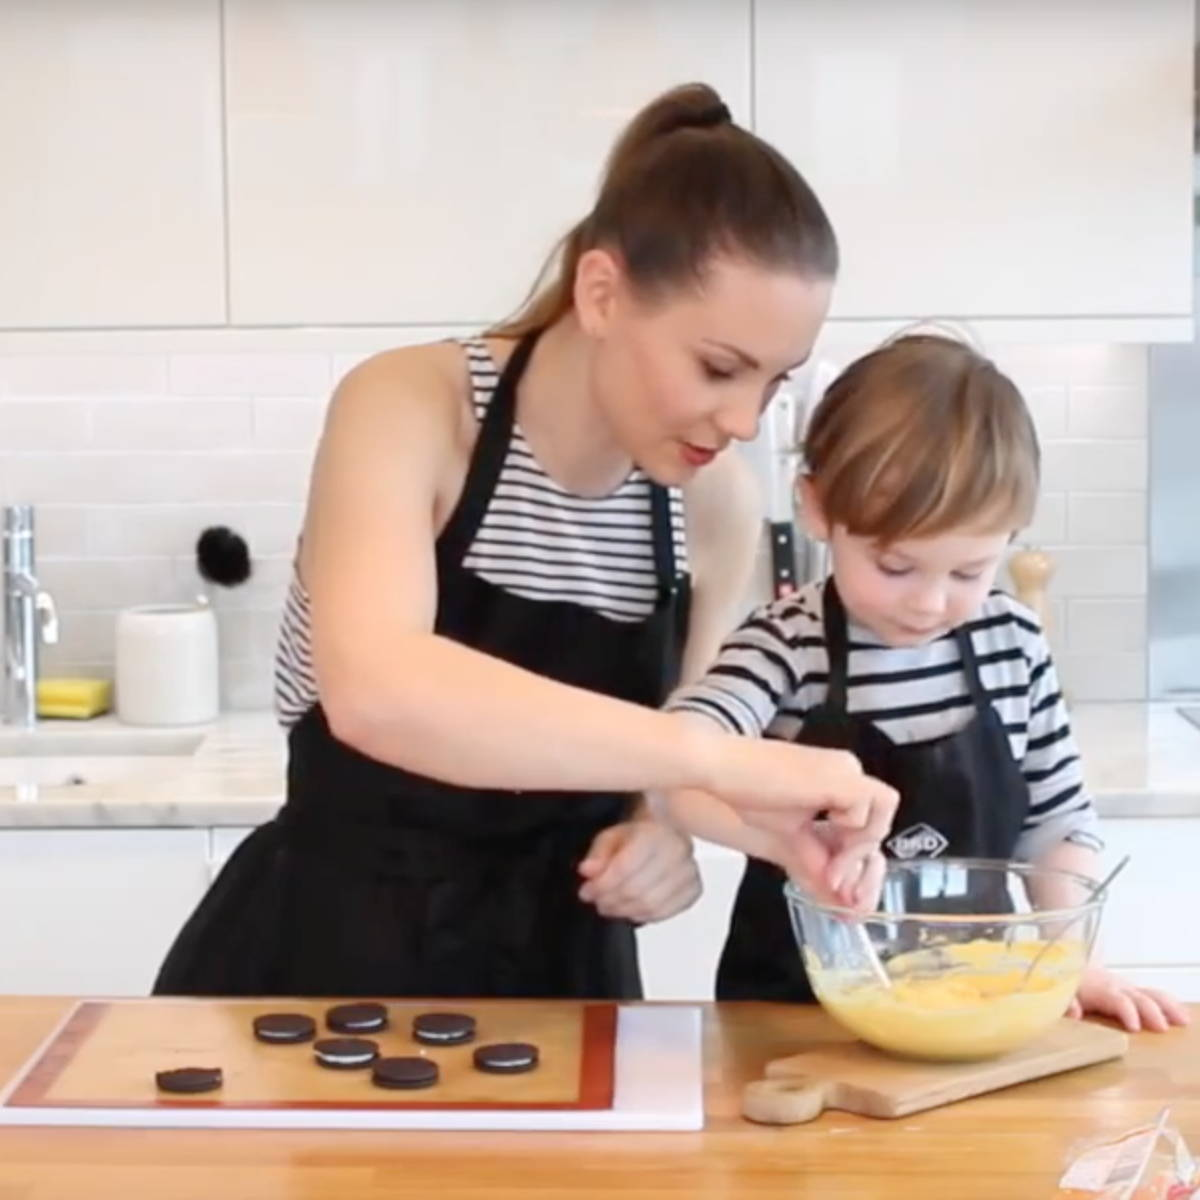 bkd baking video